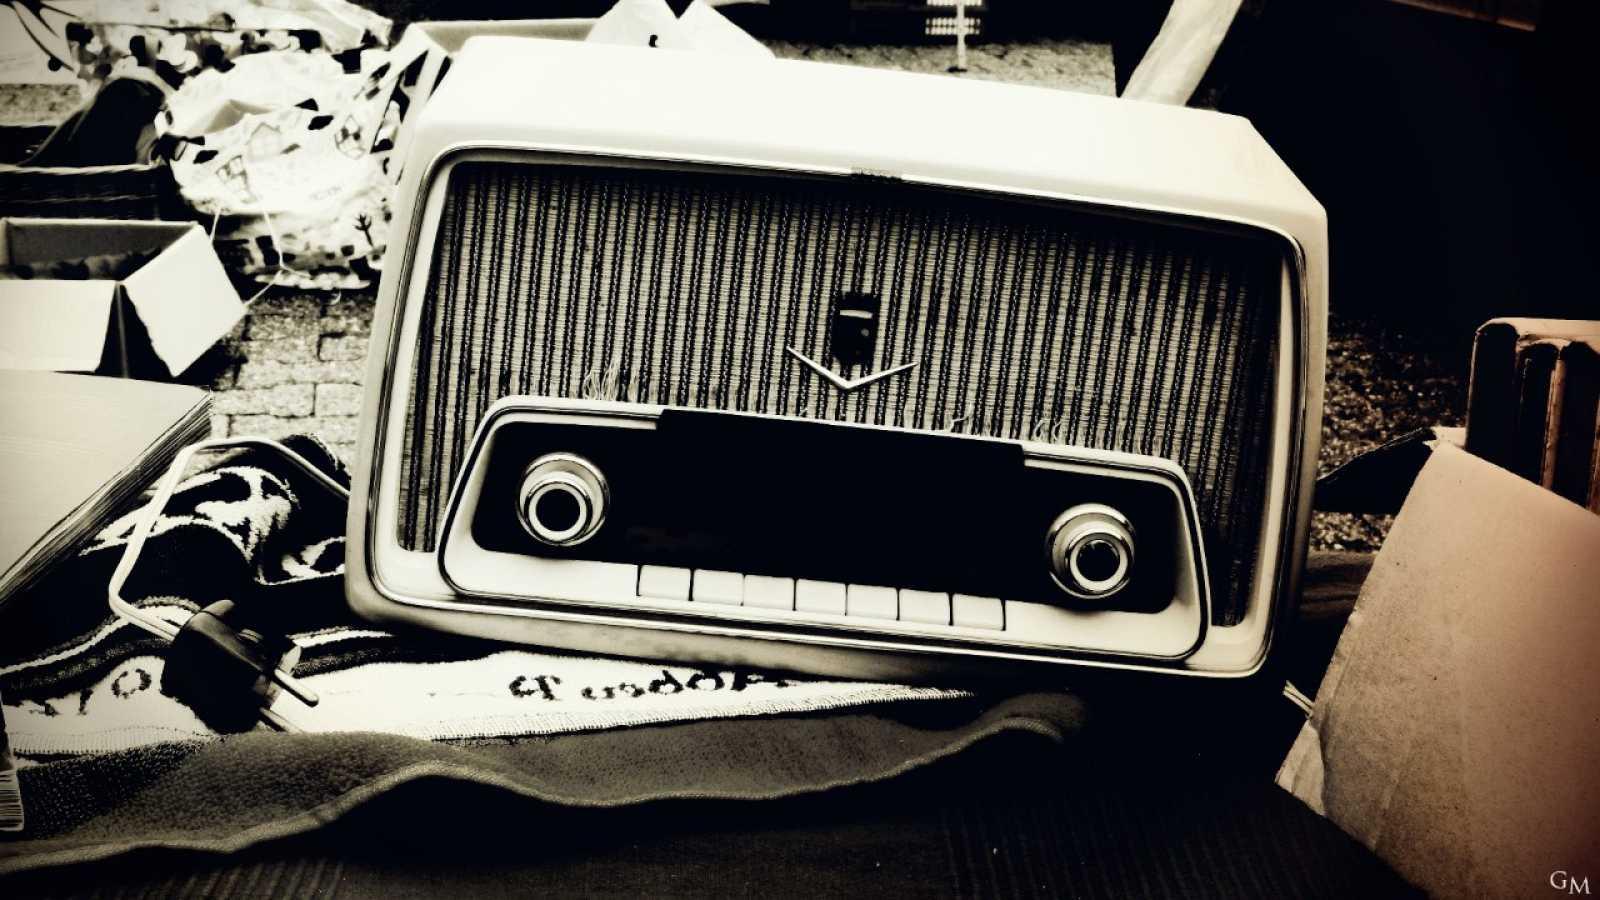 78 RPM - 10/06/21 - ESCUCHAR AHORA